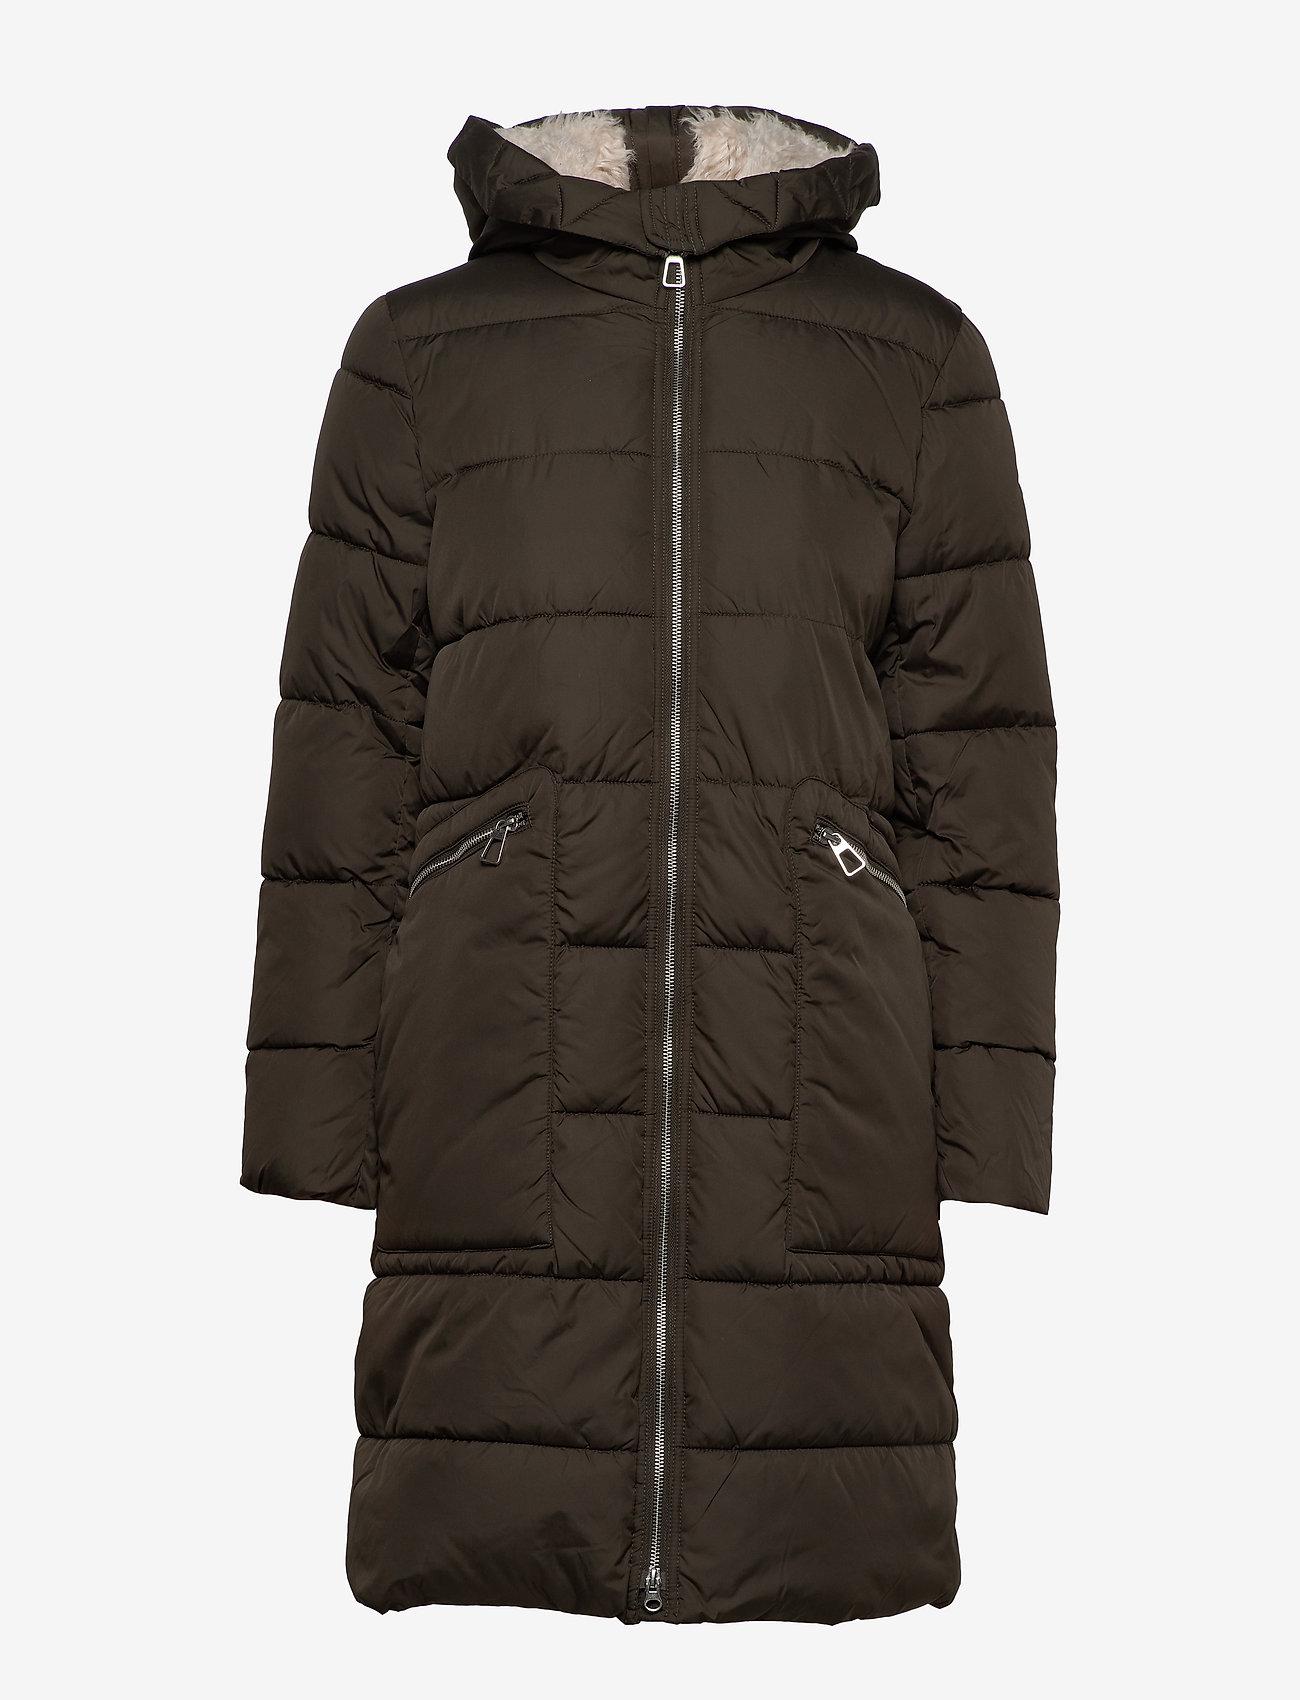 Edc By Esprit Coats Woven - Jackets &